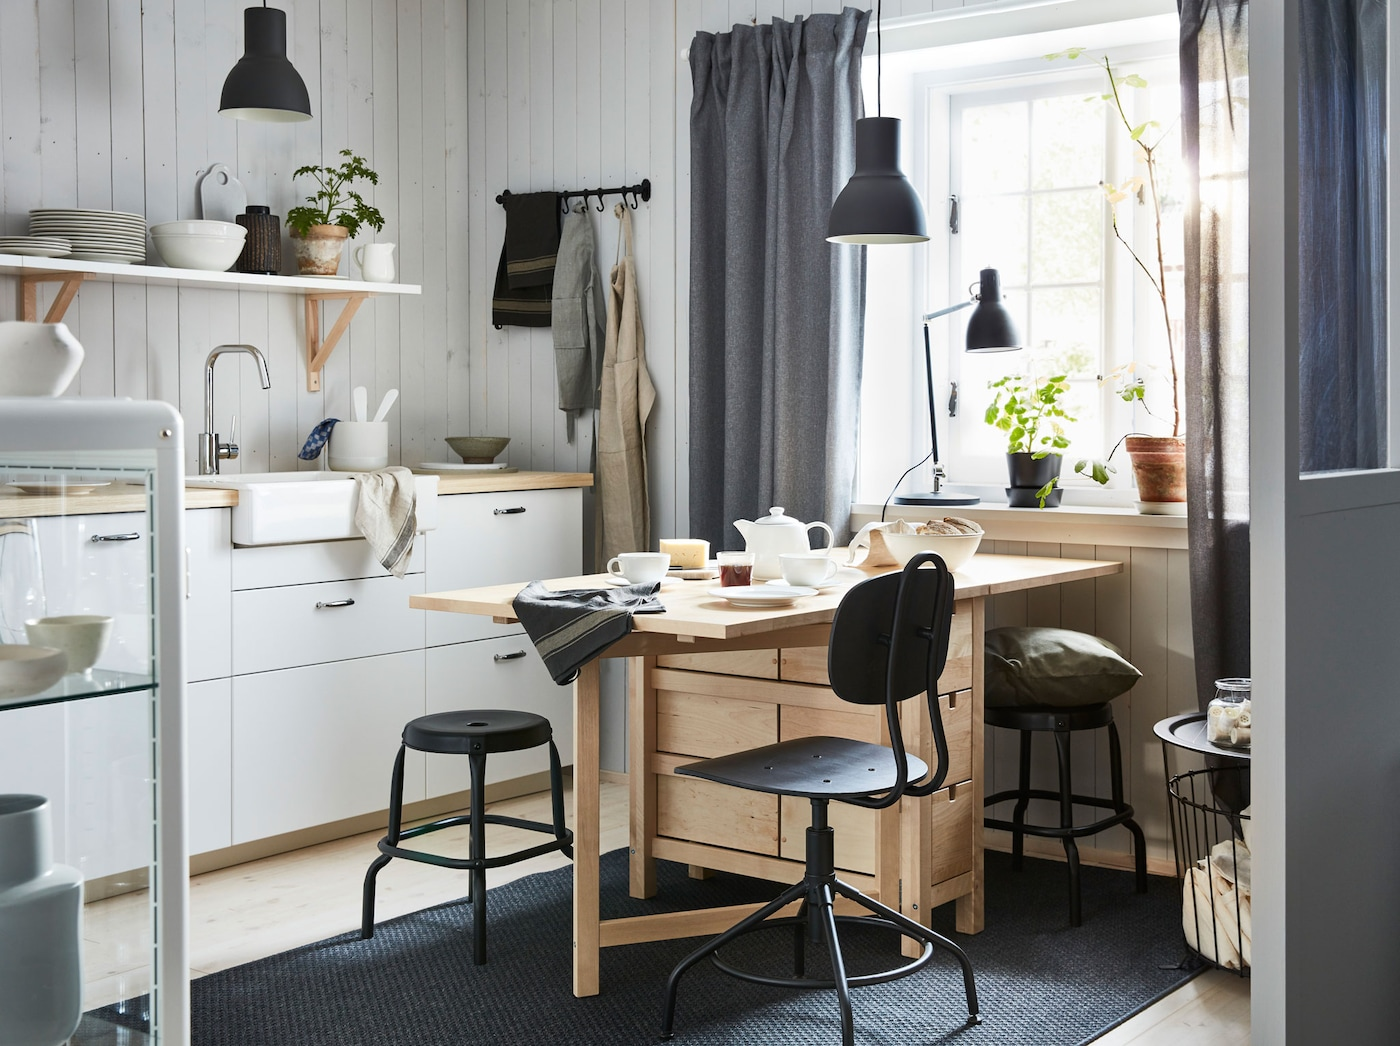 Sip And Sew Away In A Small Space Ikea Malaysia Ikea